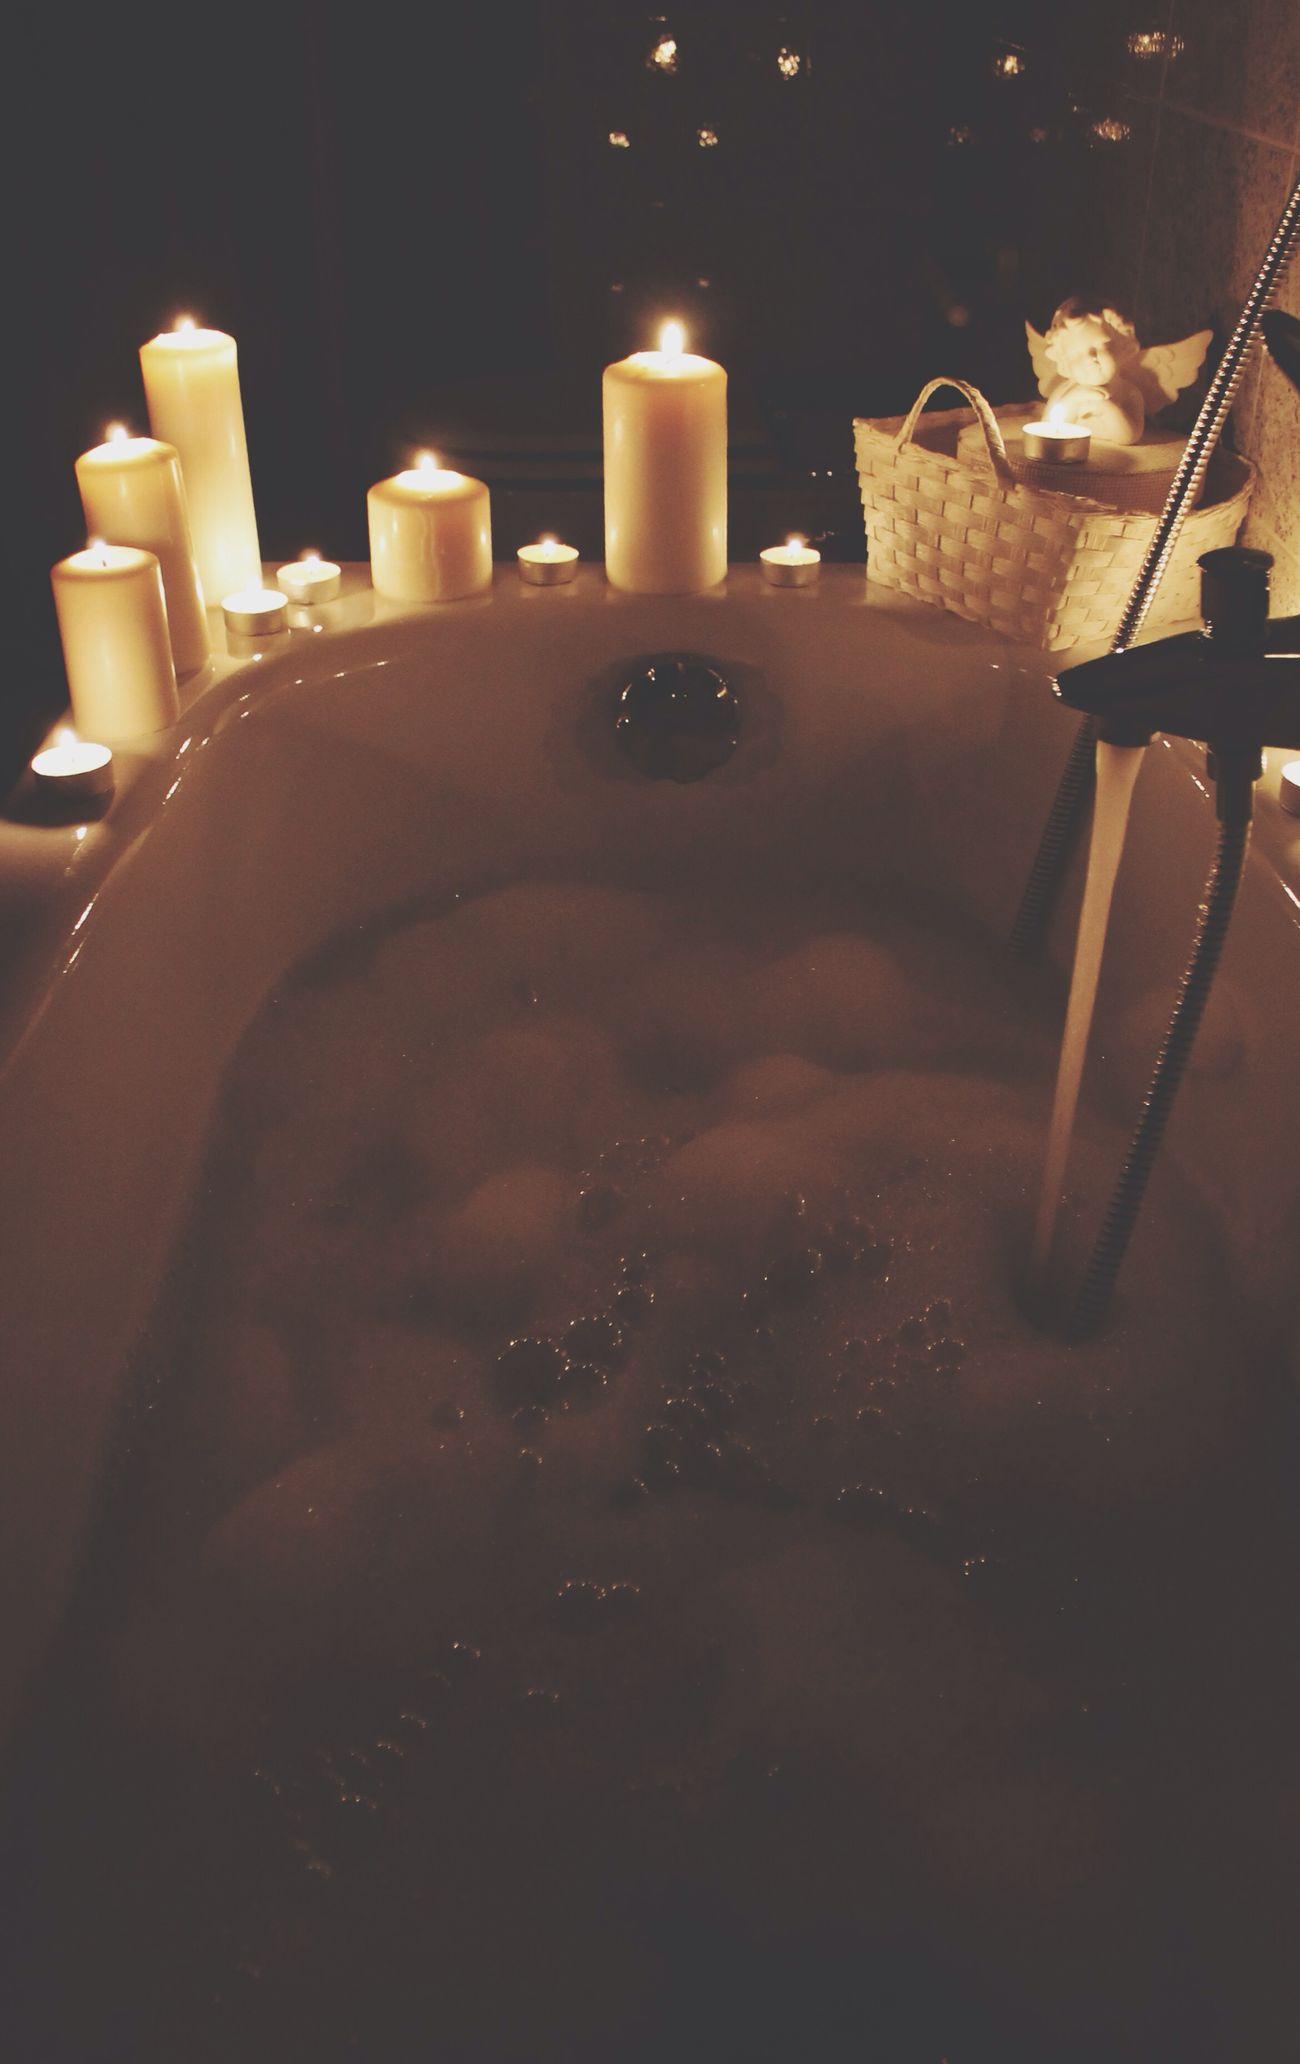 Bagno Caldo Candele Relax Postsecondaprova